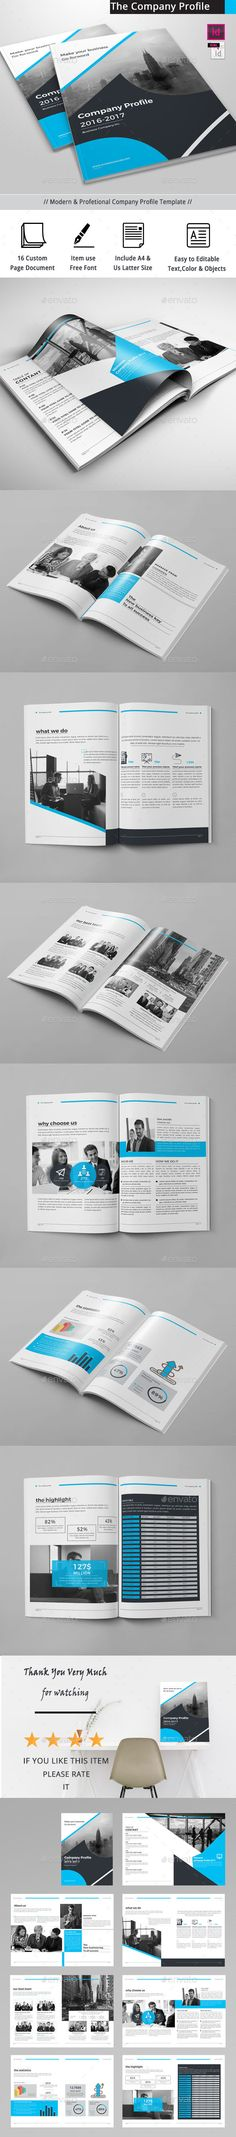 The Company Profile — InDesign INDD #brochure #unique • Download ➝ https://graphicriver.net/item/the-company-profile/18923069?ref=pxcr